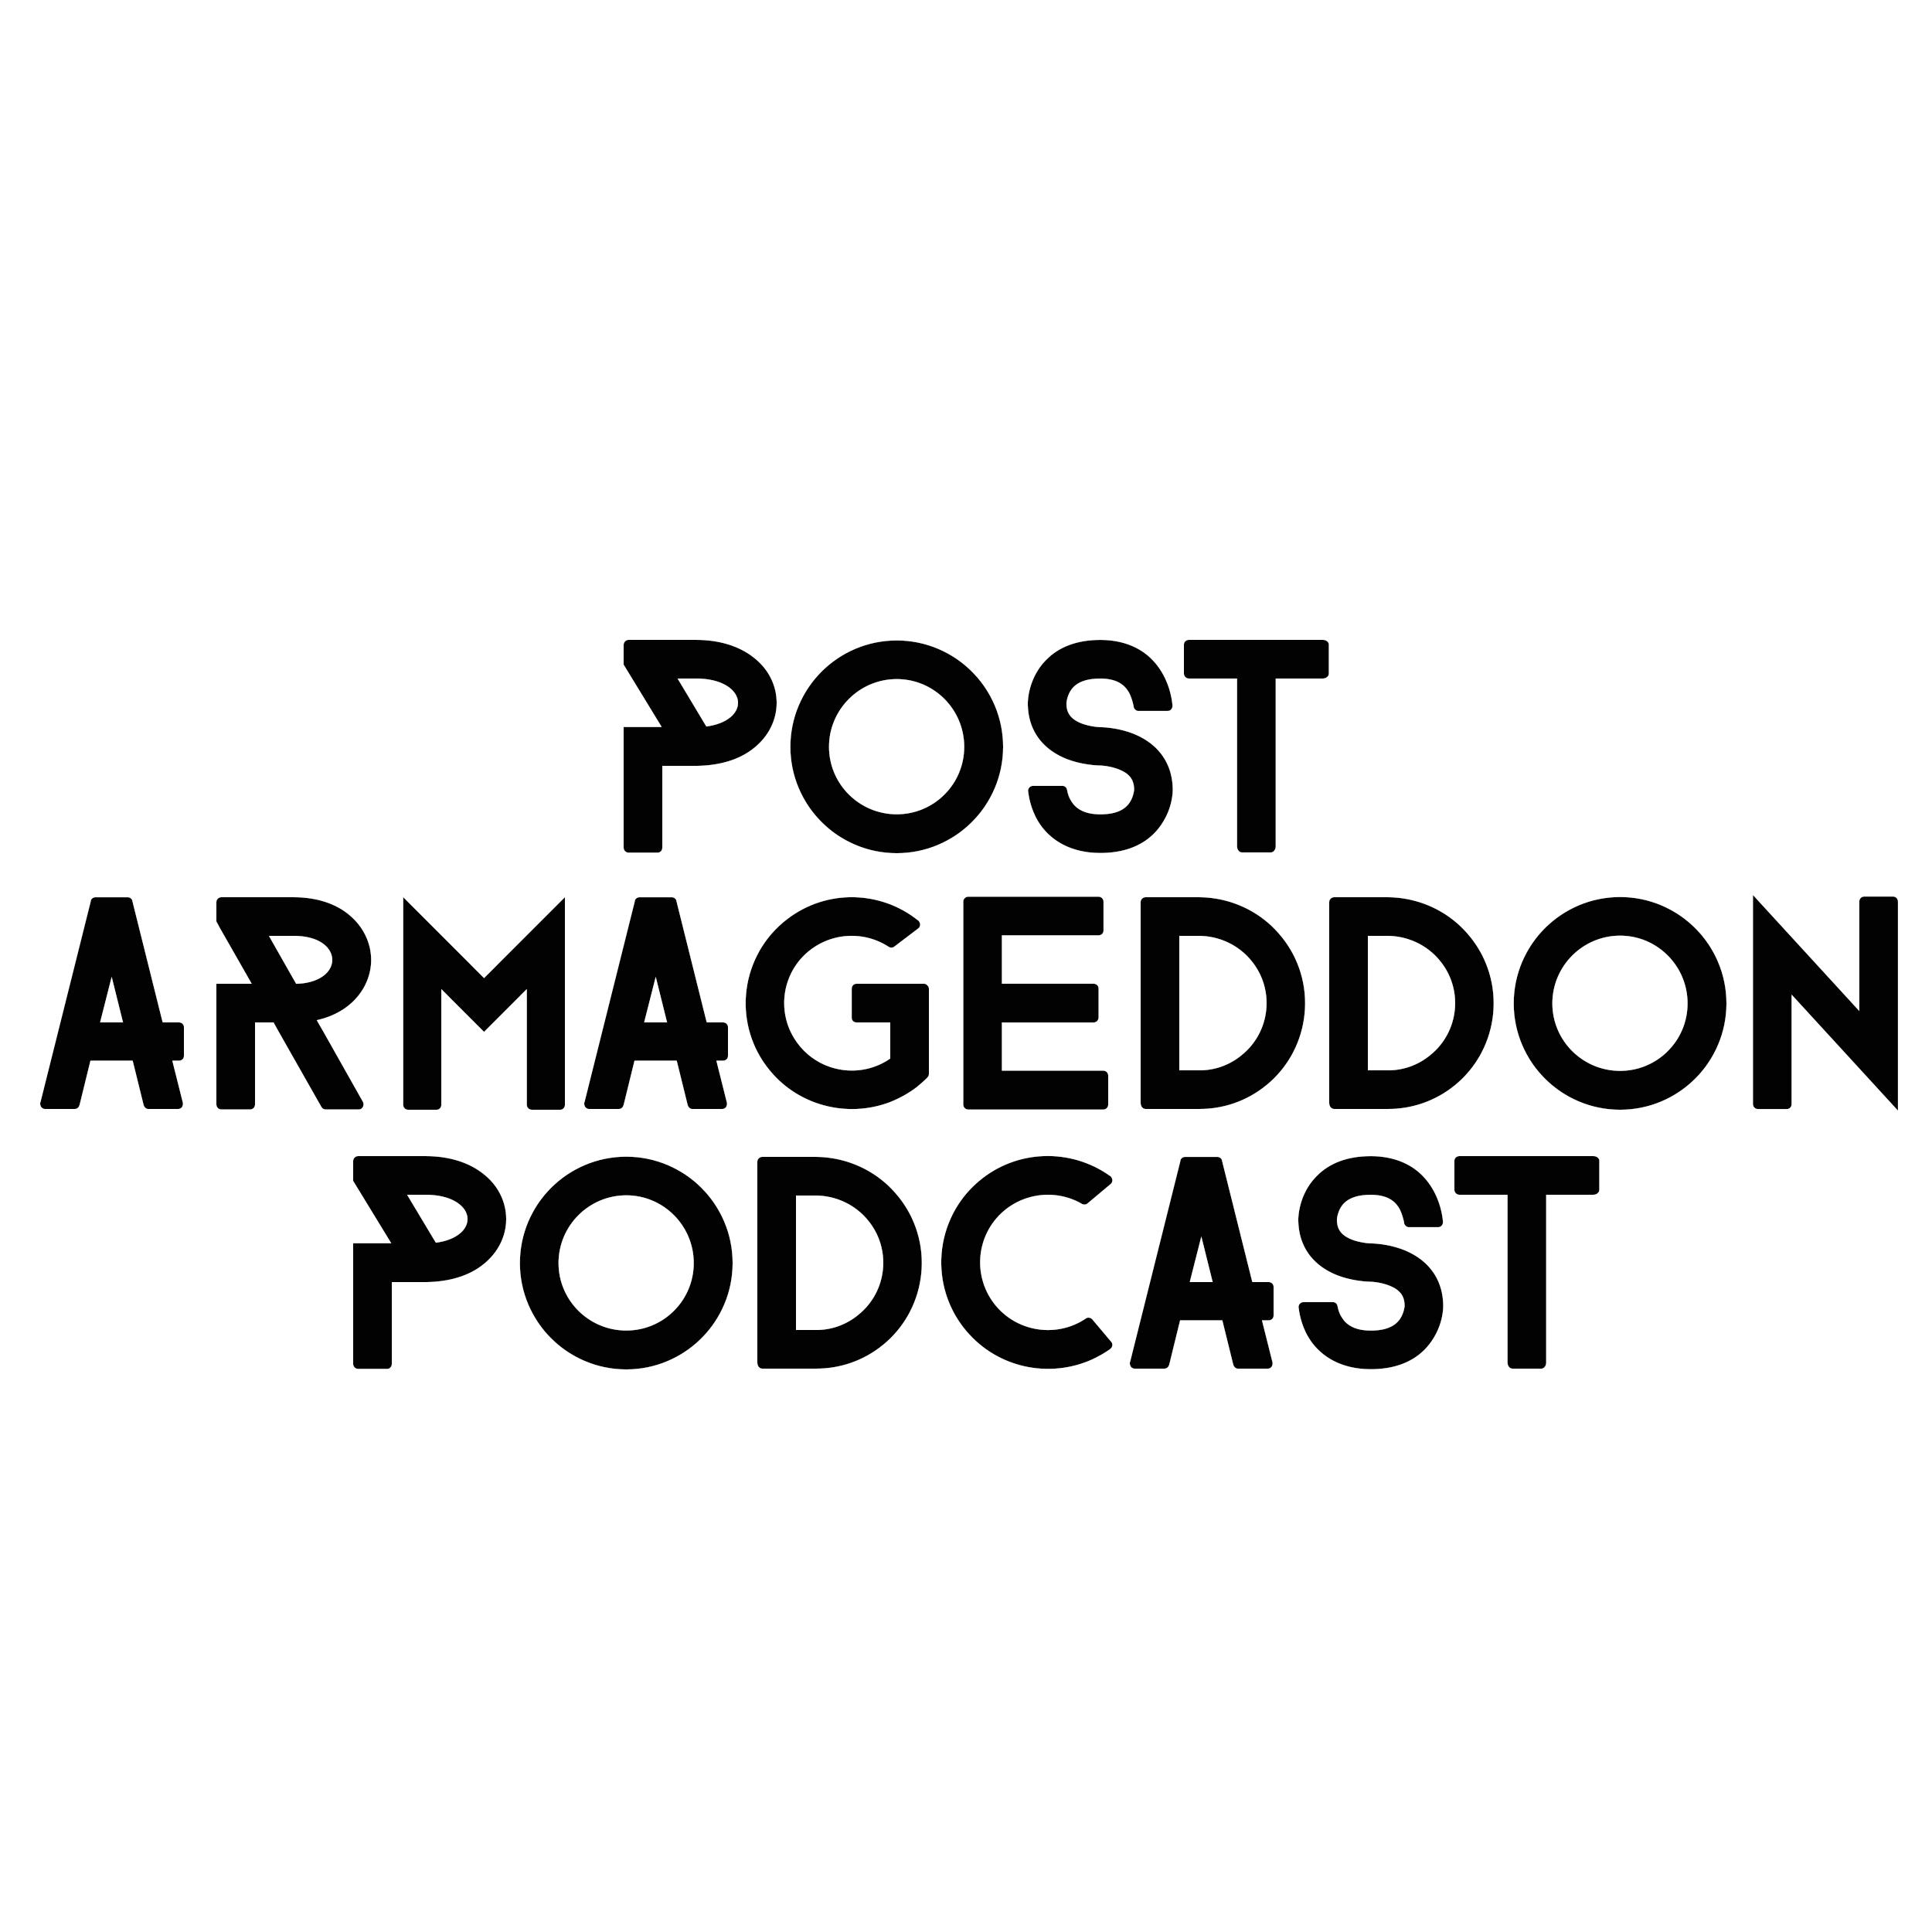 Post Armageddon Podcast